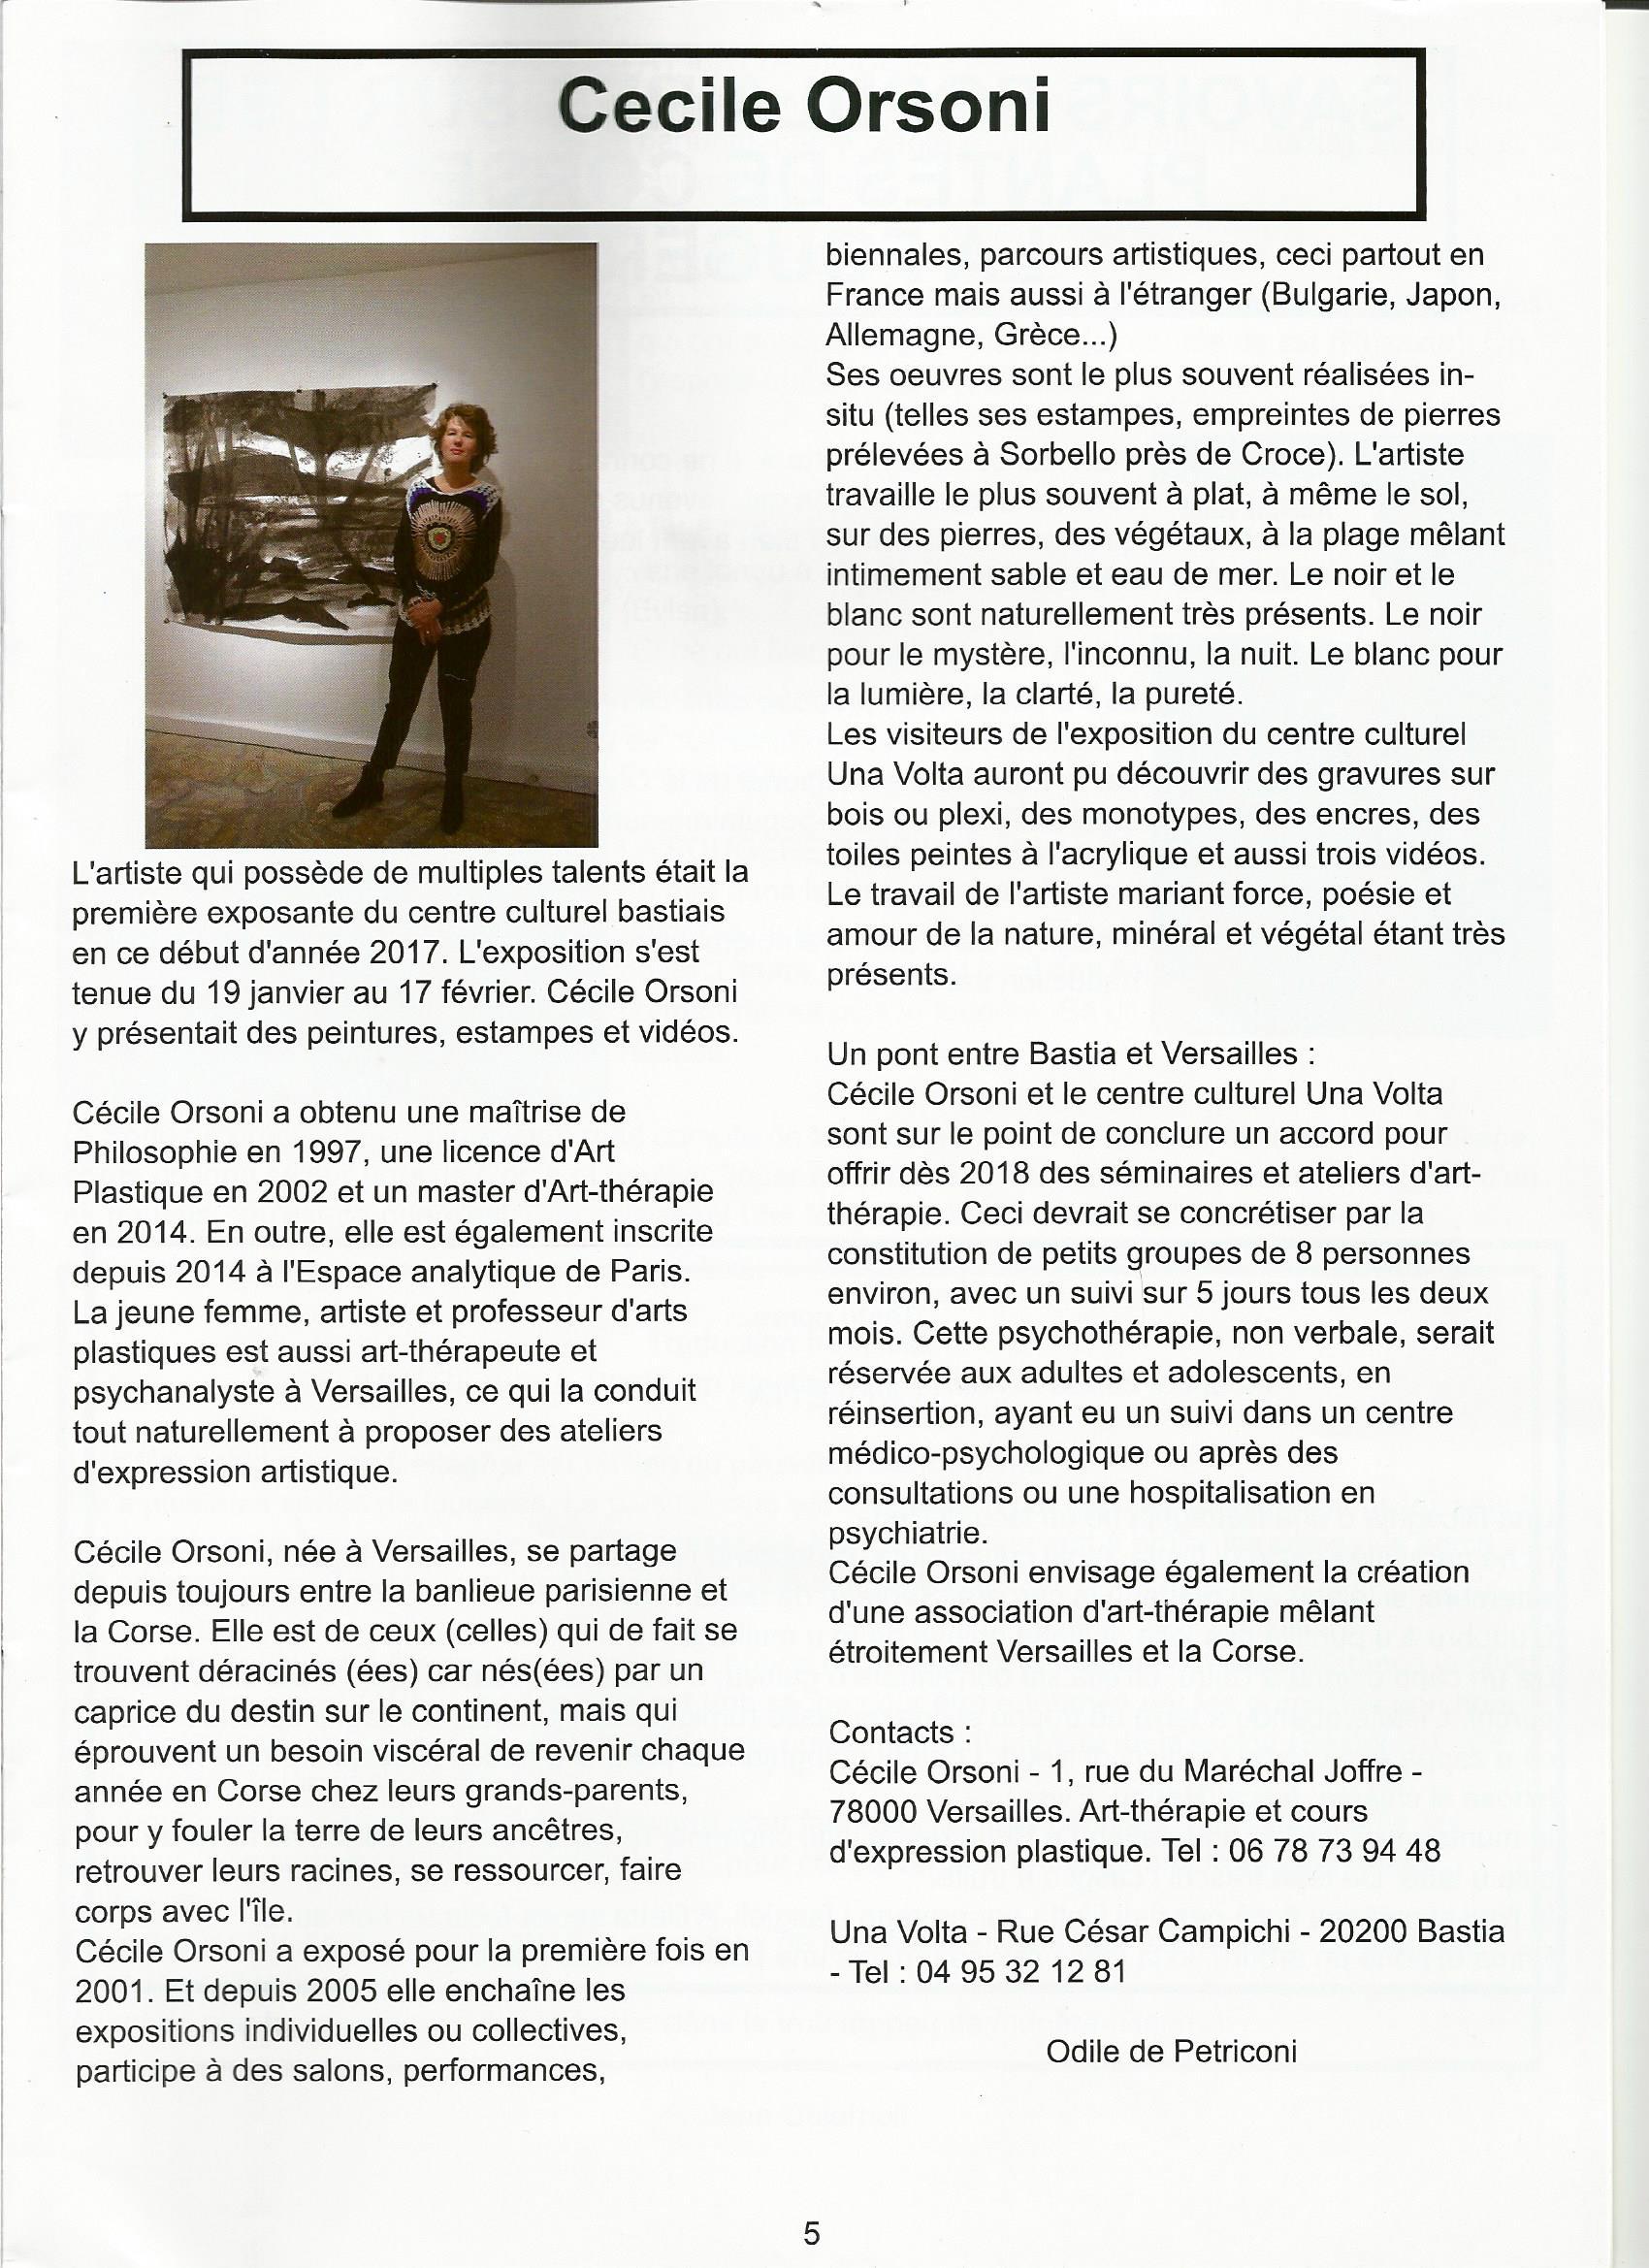 art-thérapie Versailles 78 Bastia